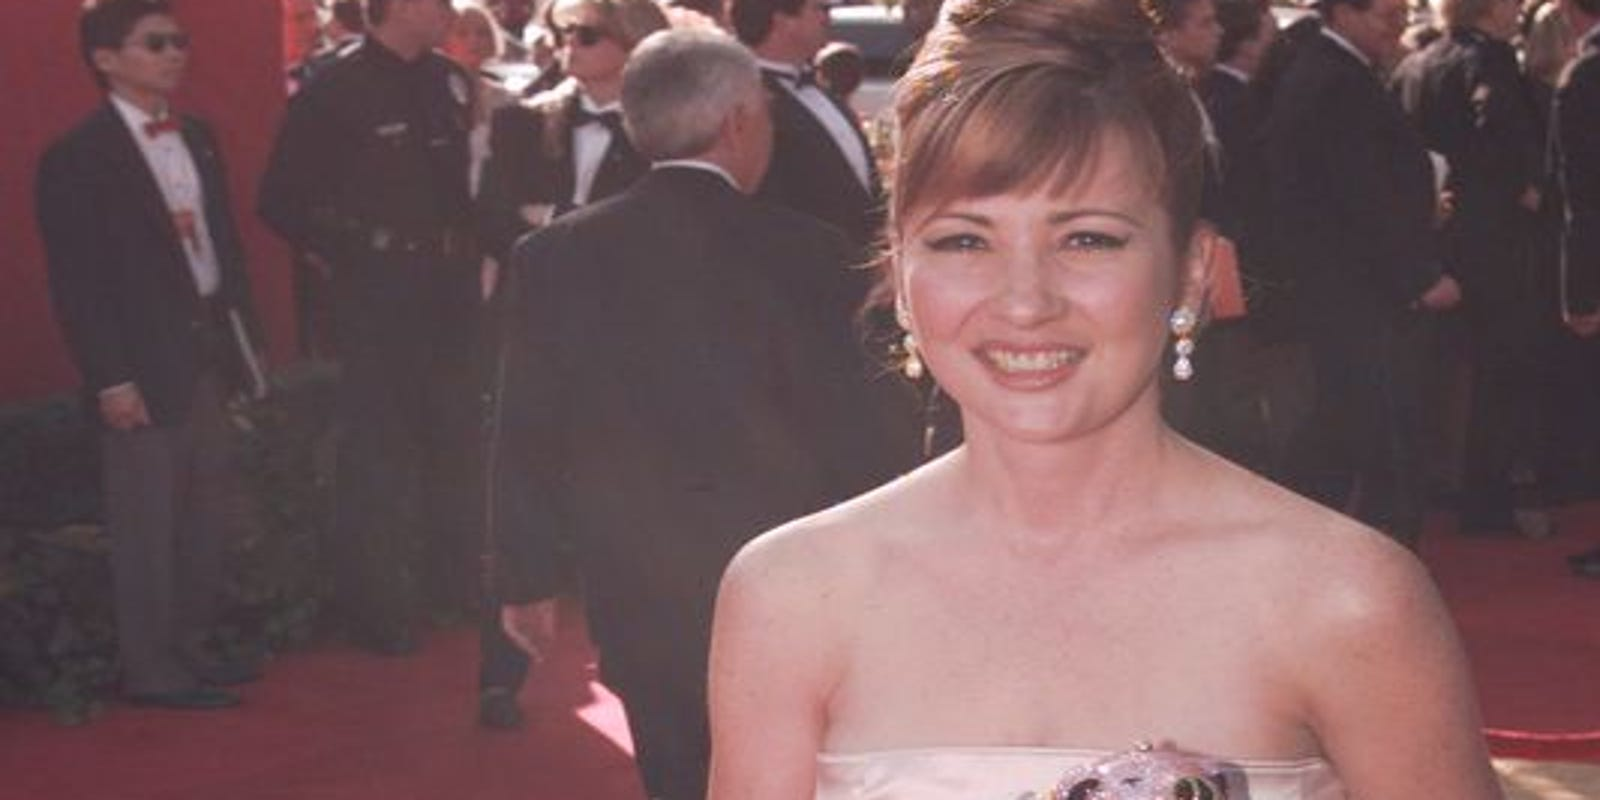 Rugrats\' actress Christine Cavanaugh dies at 51